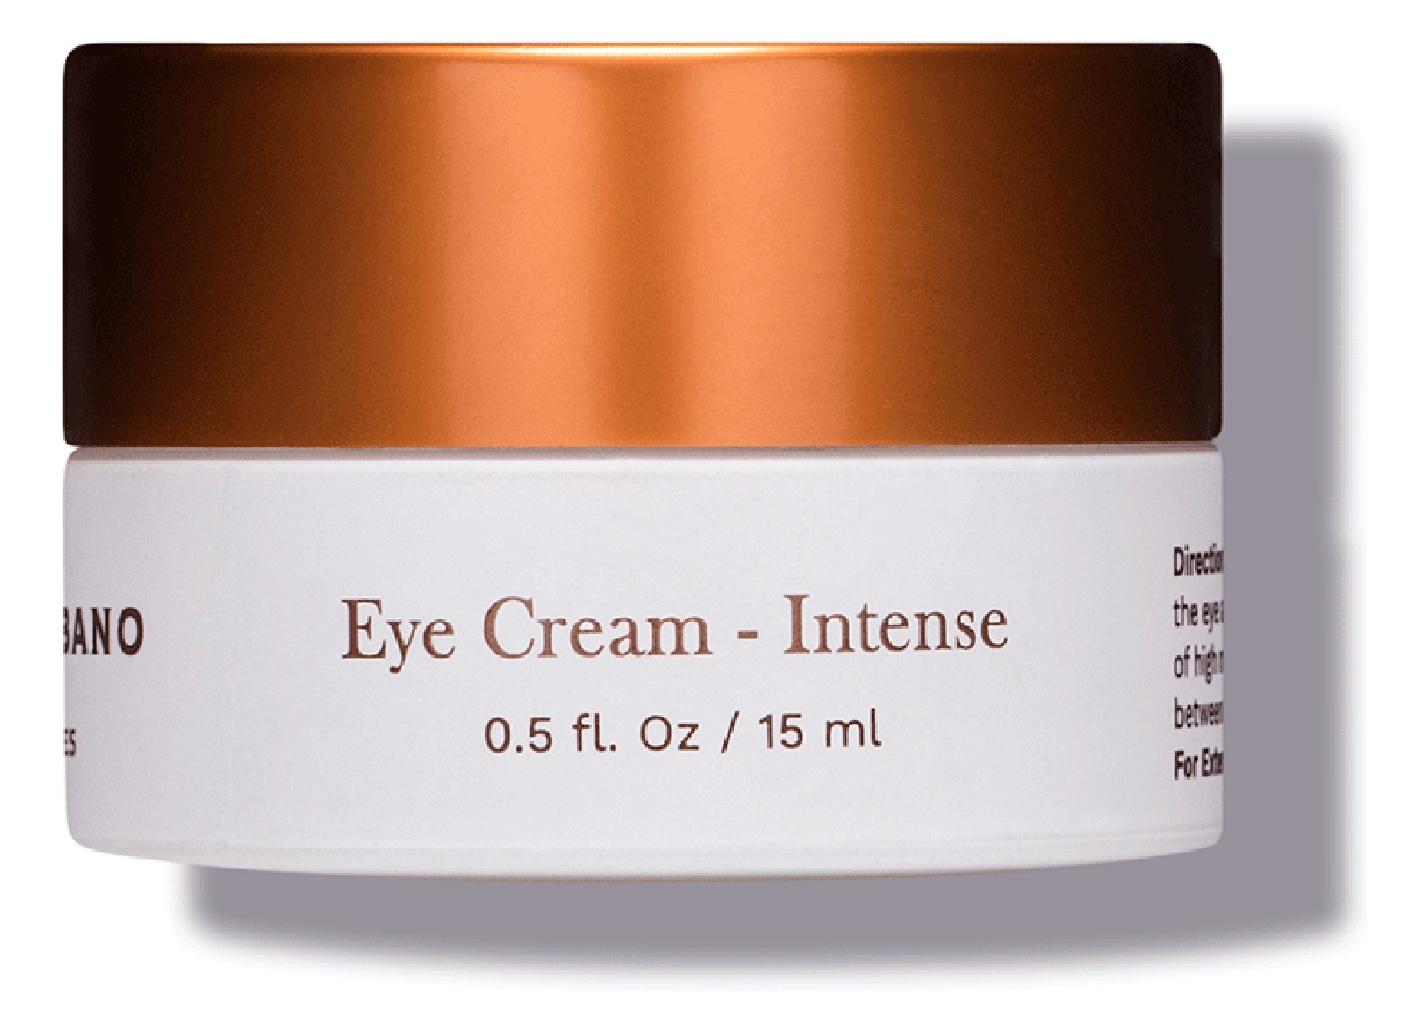 Volto Urbano Eye Cream Intense